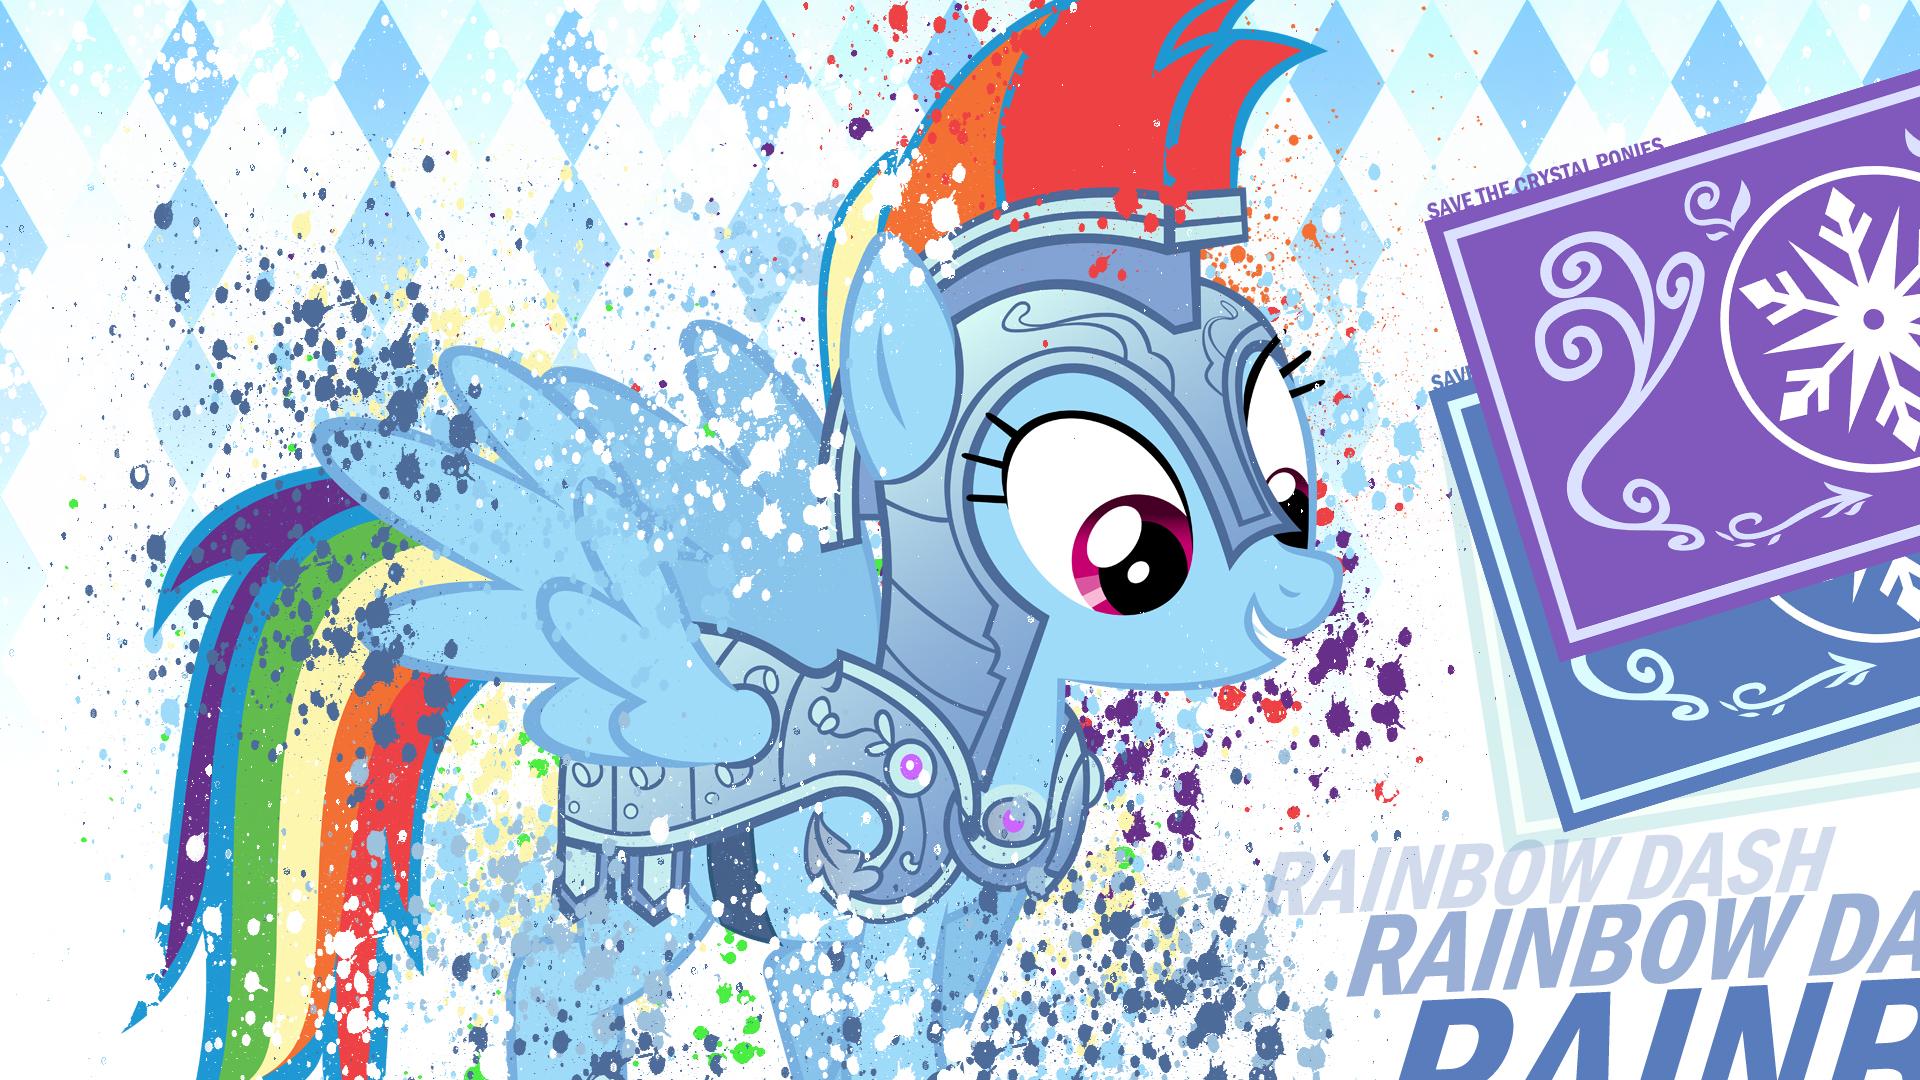 MLP Crystal Rainbow Dash by MysteriousKaos and Xtrl